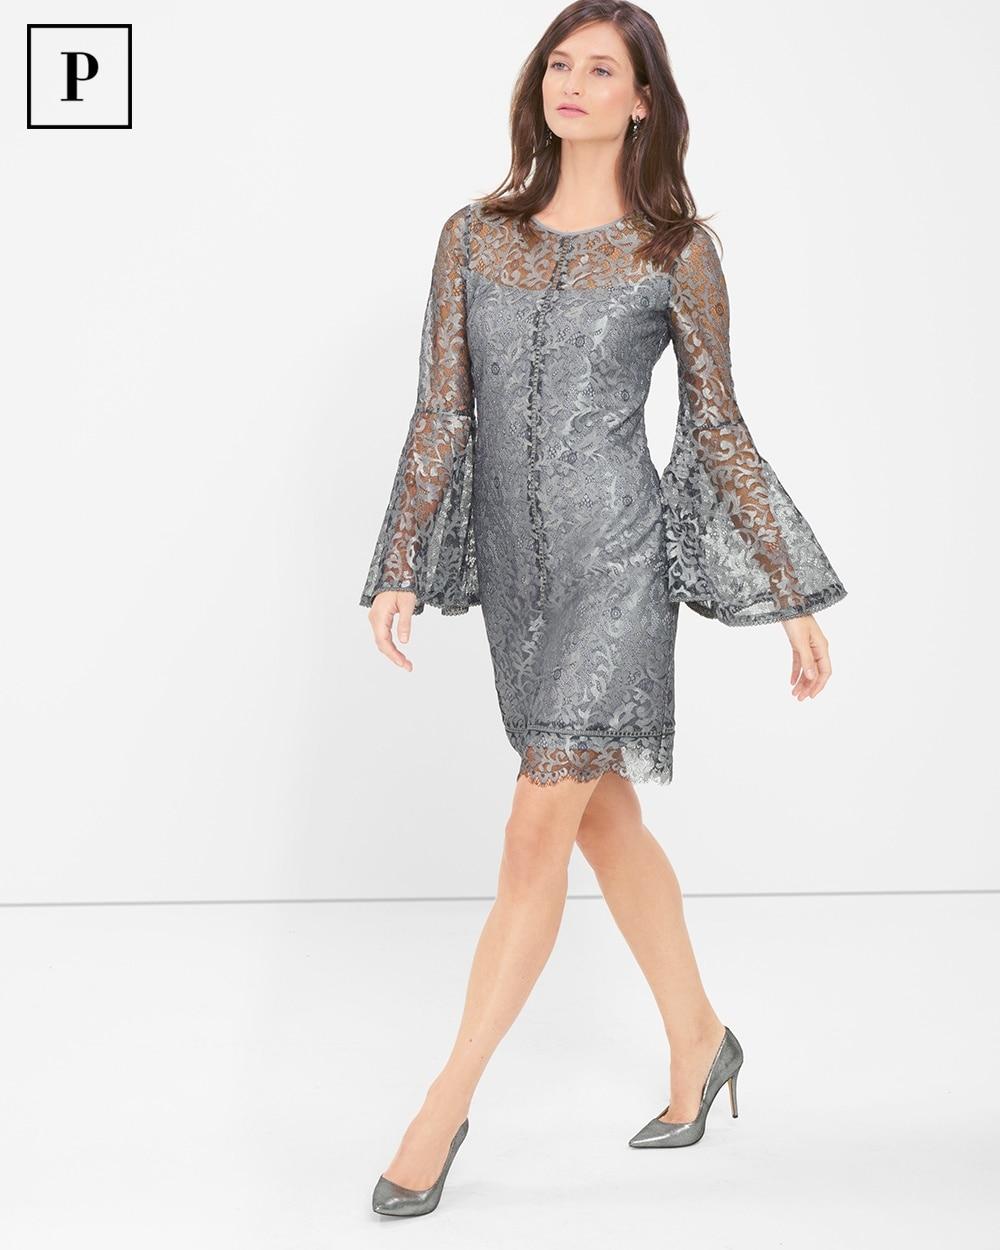 e285ead4fa Return to thumbnail image selection Petite Metallic Lace Bell-Sleeve Shift  Dress video preview image